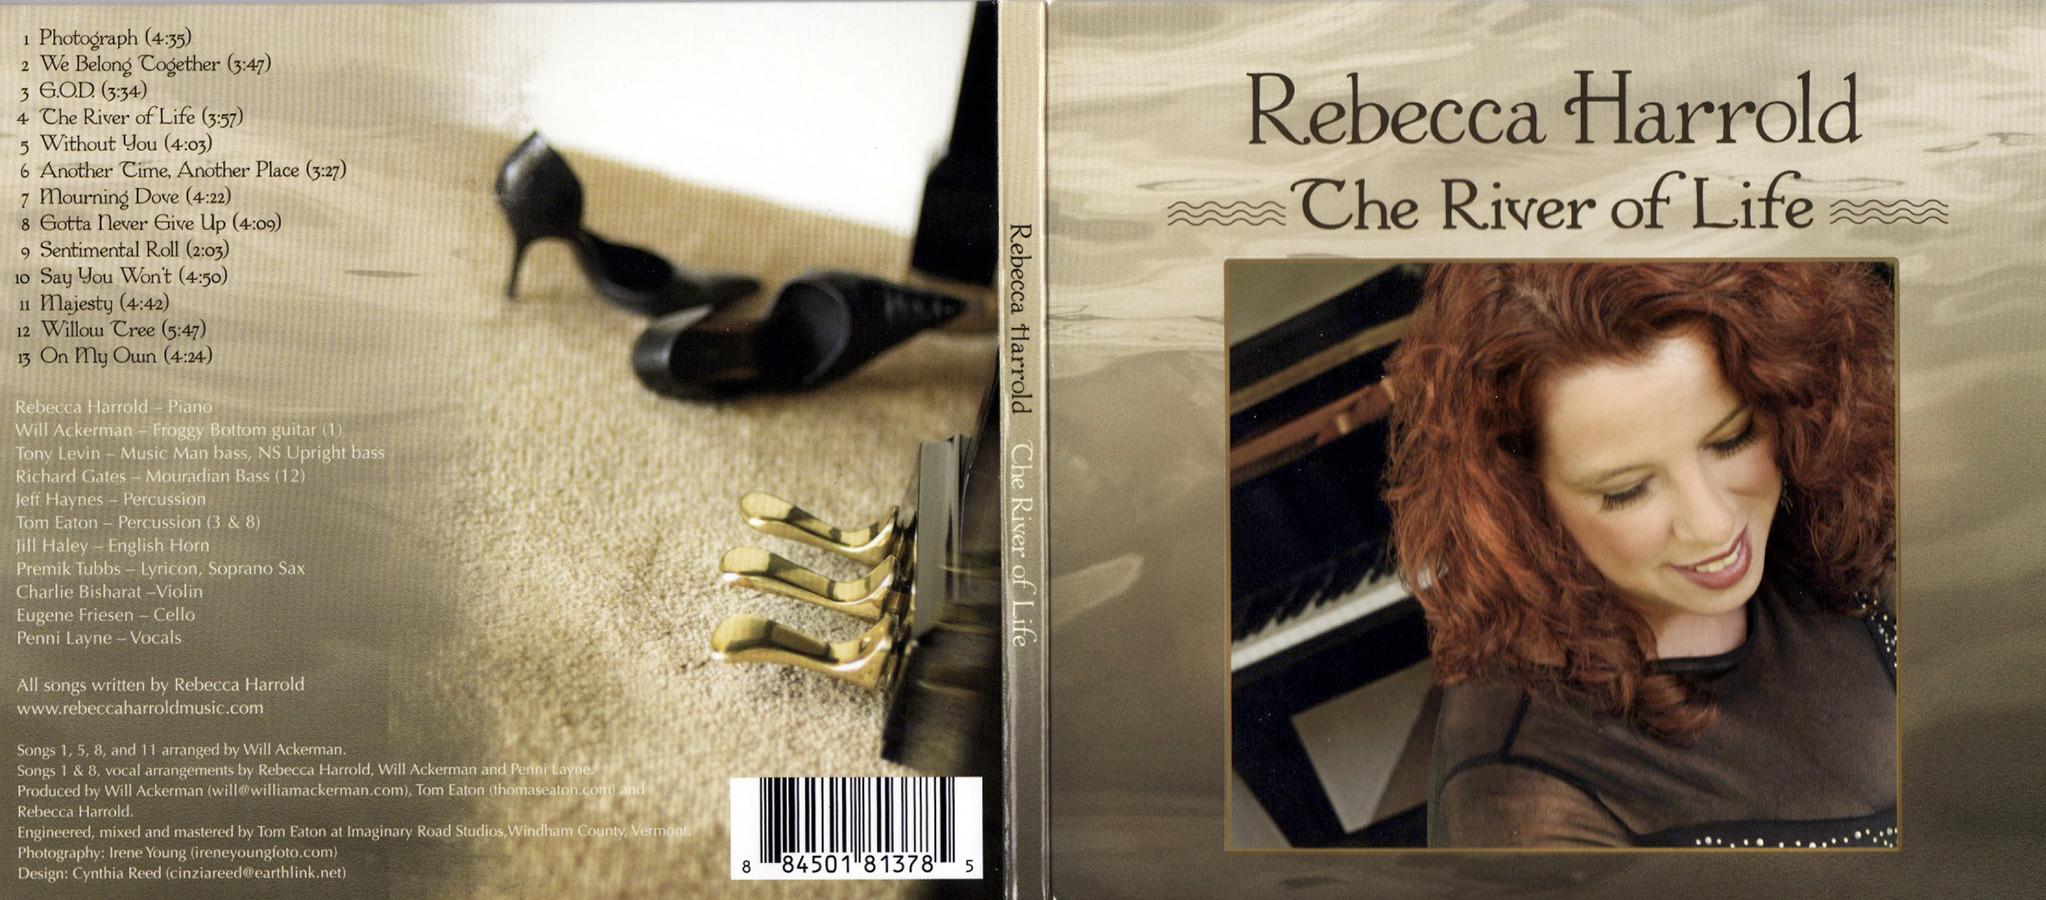 Rebecca Harrold, The RIver of Life